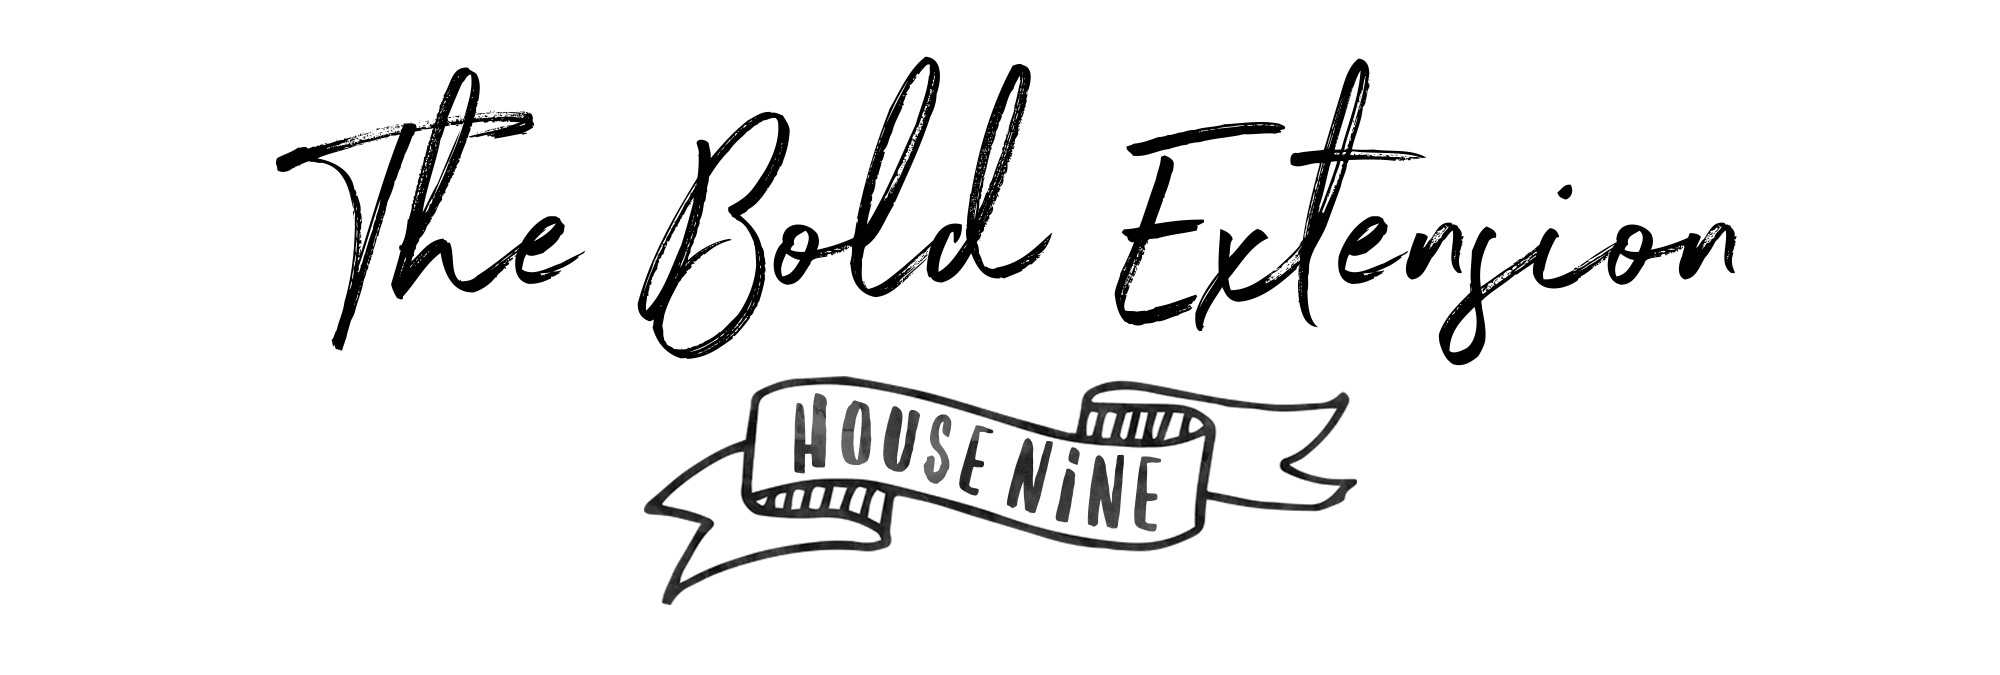 FINAL-HOUSE-9-LOGO.png